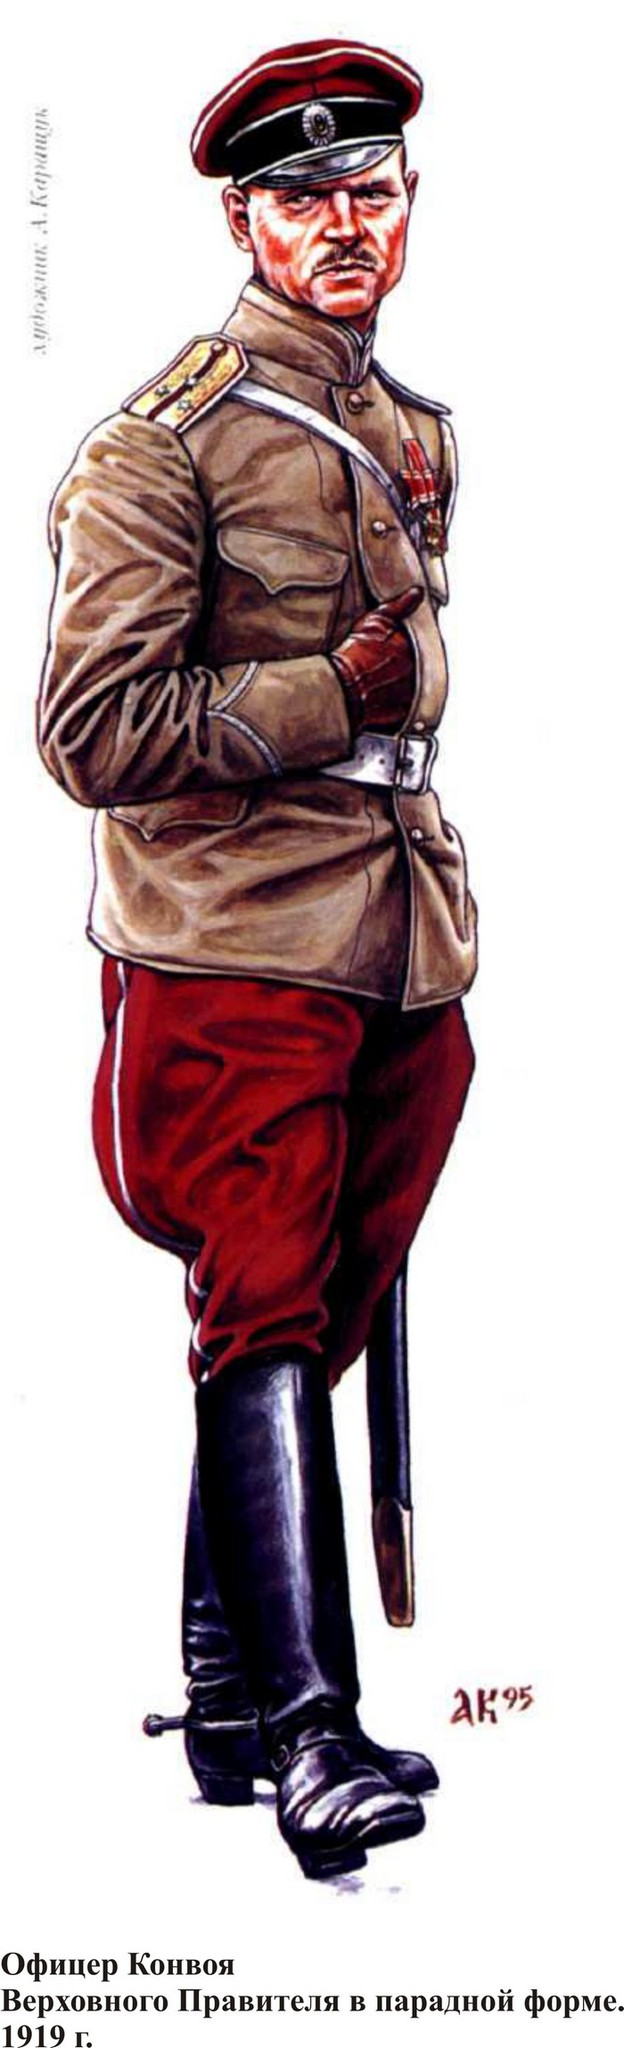 Конвой адмирала Колчака